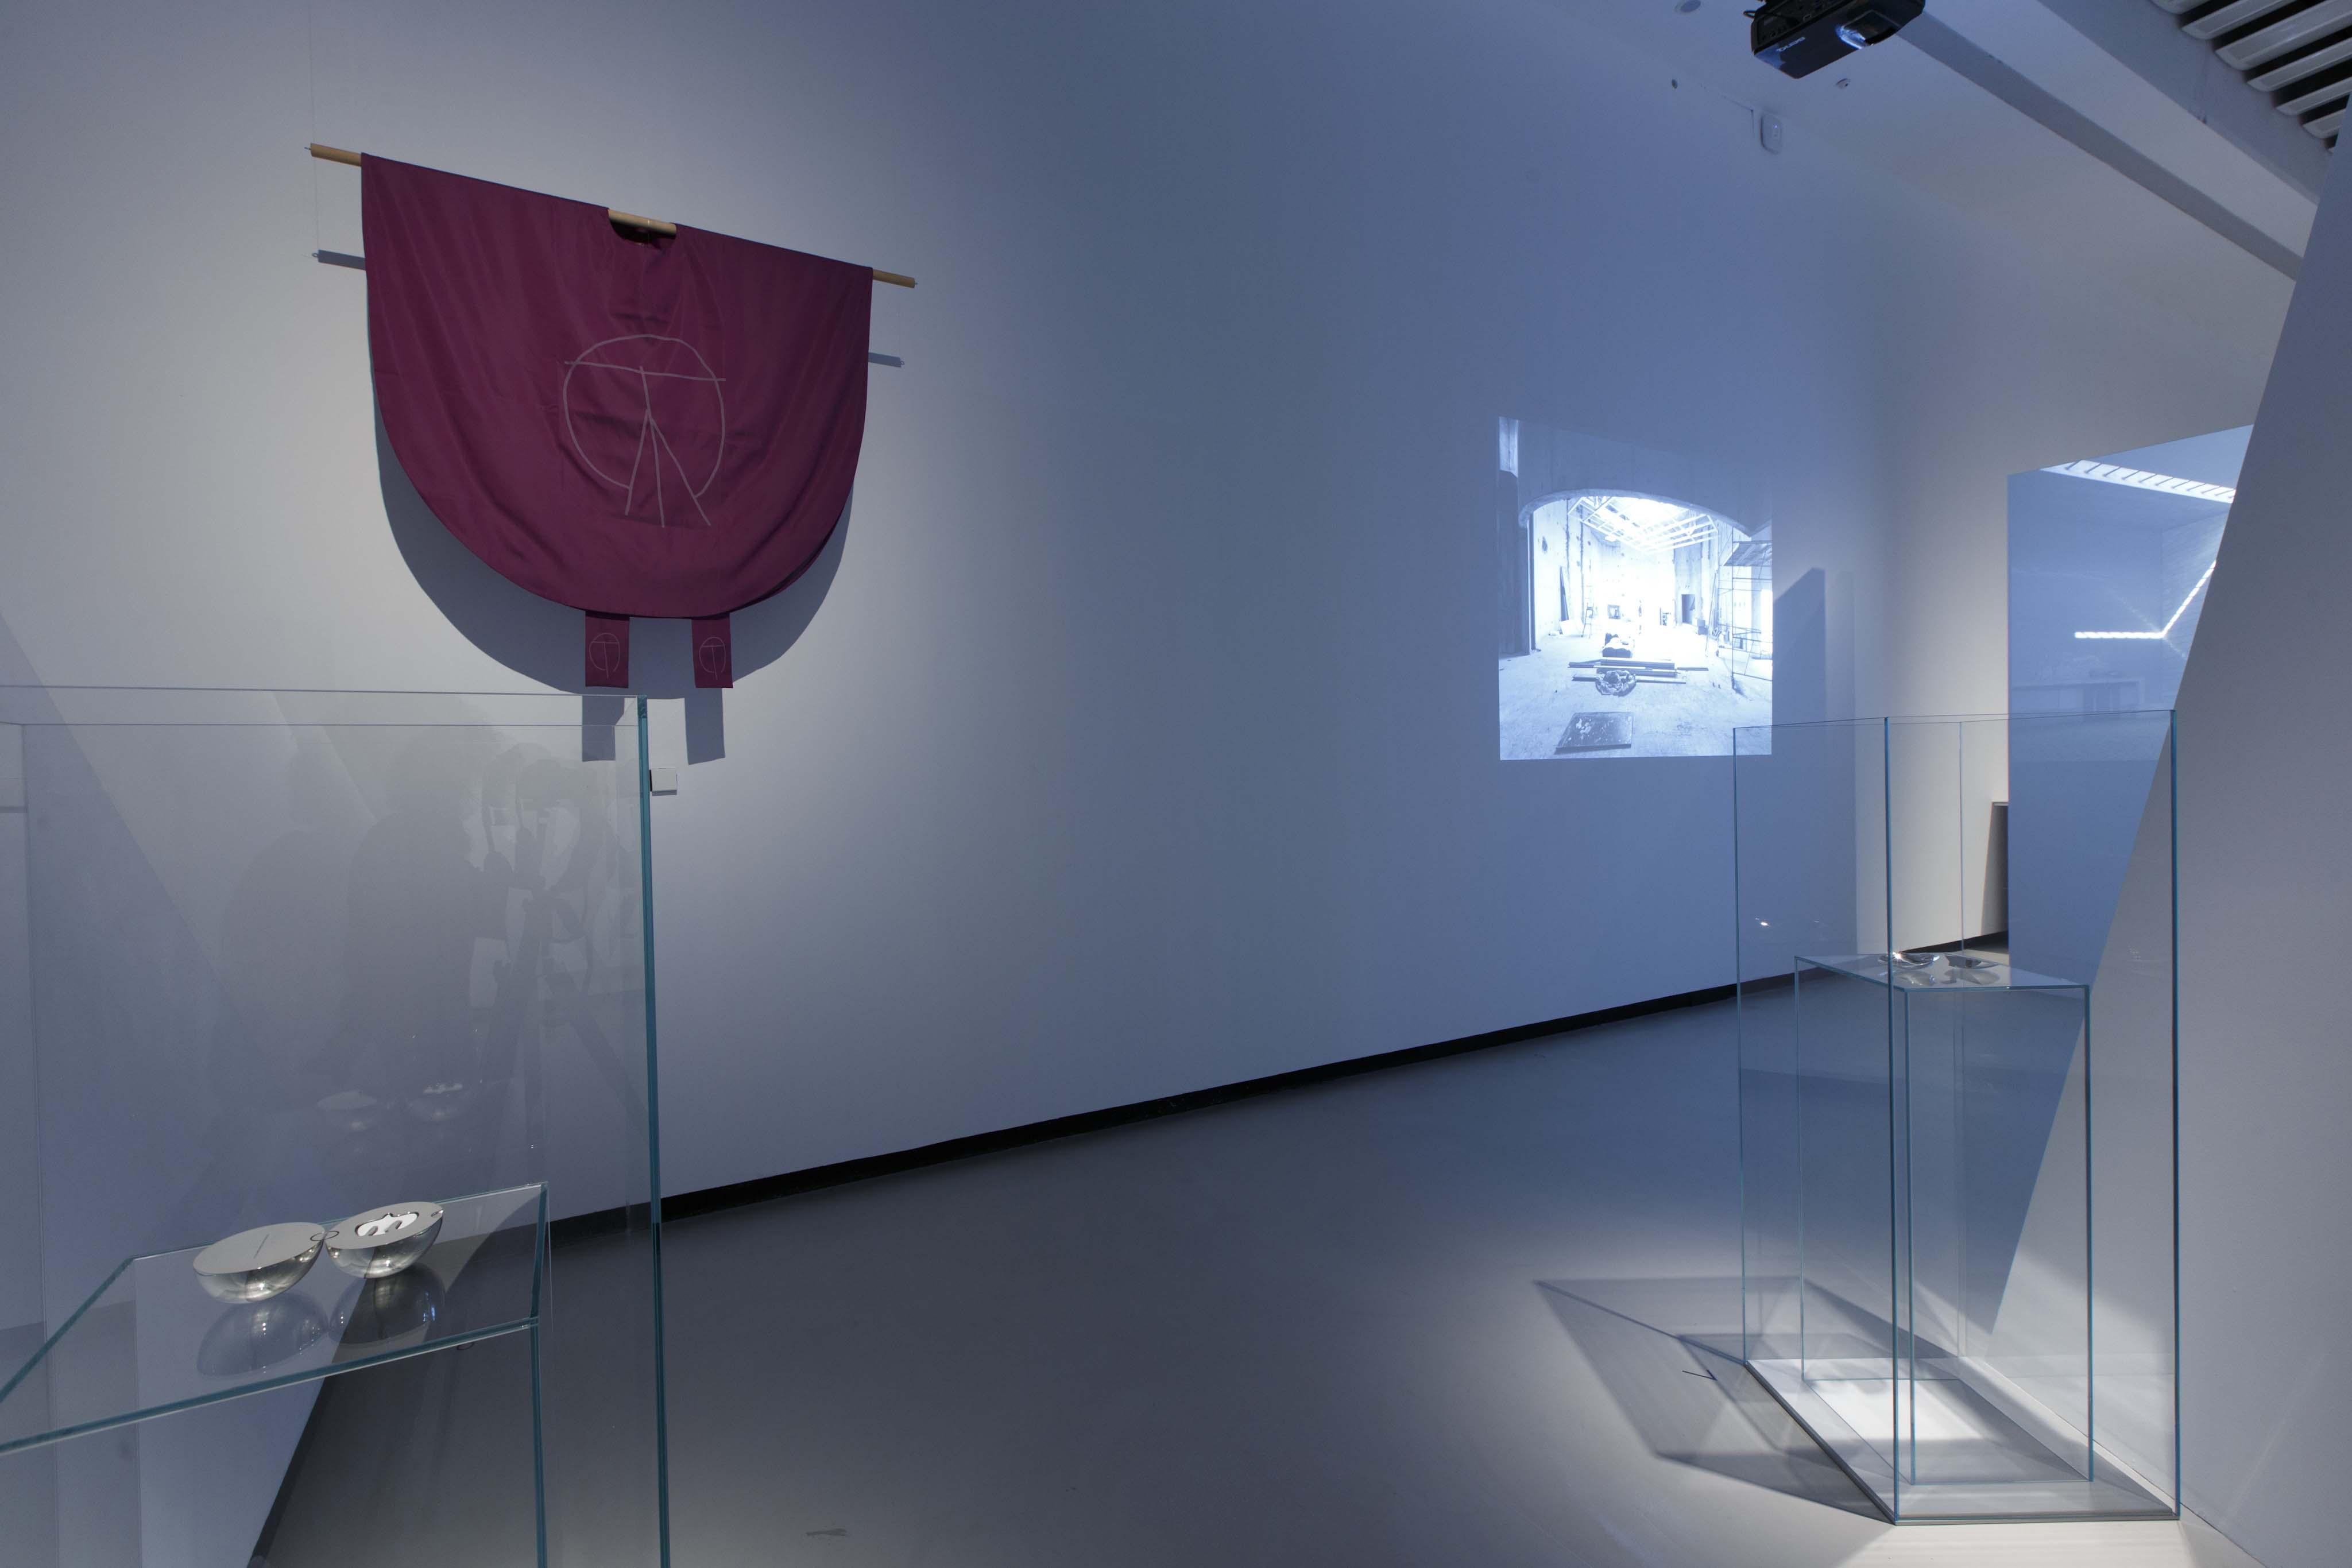 Opening mostra: ALVARO SIZA, SACRO ©Musacchio & Ianniello